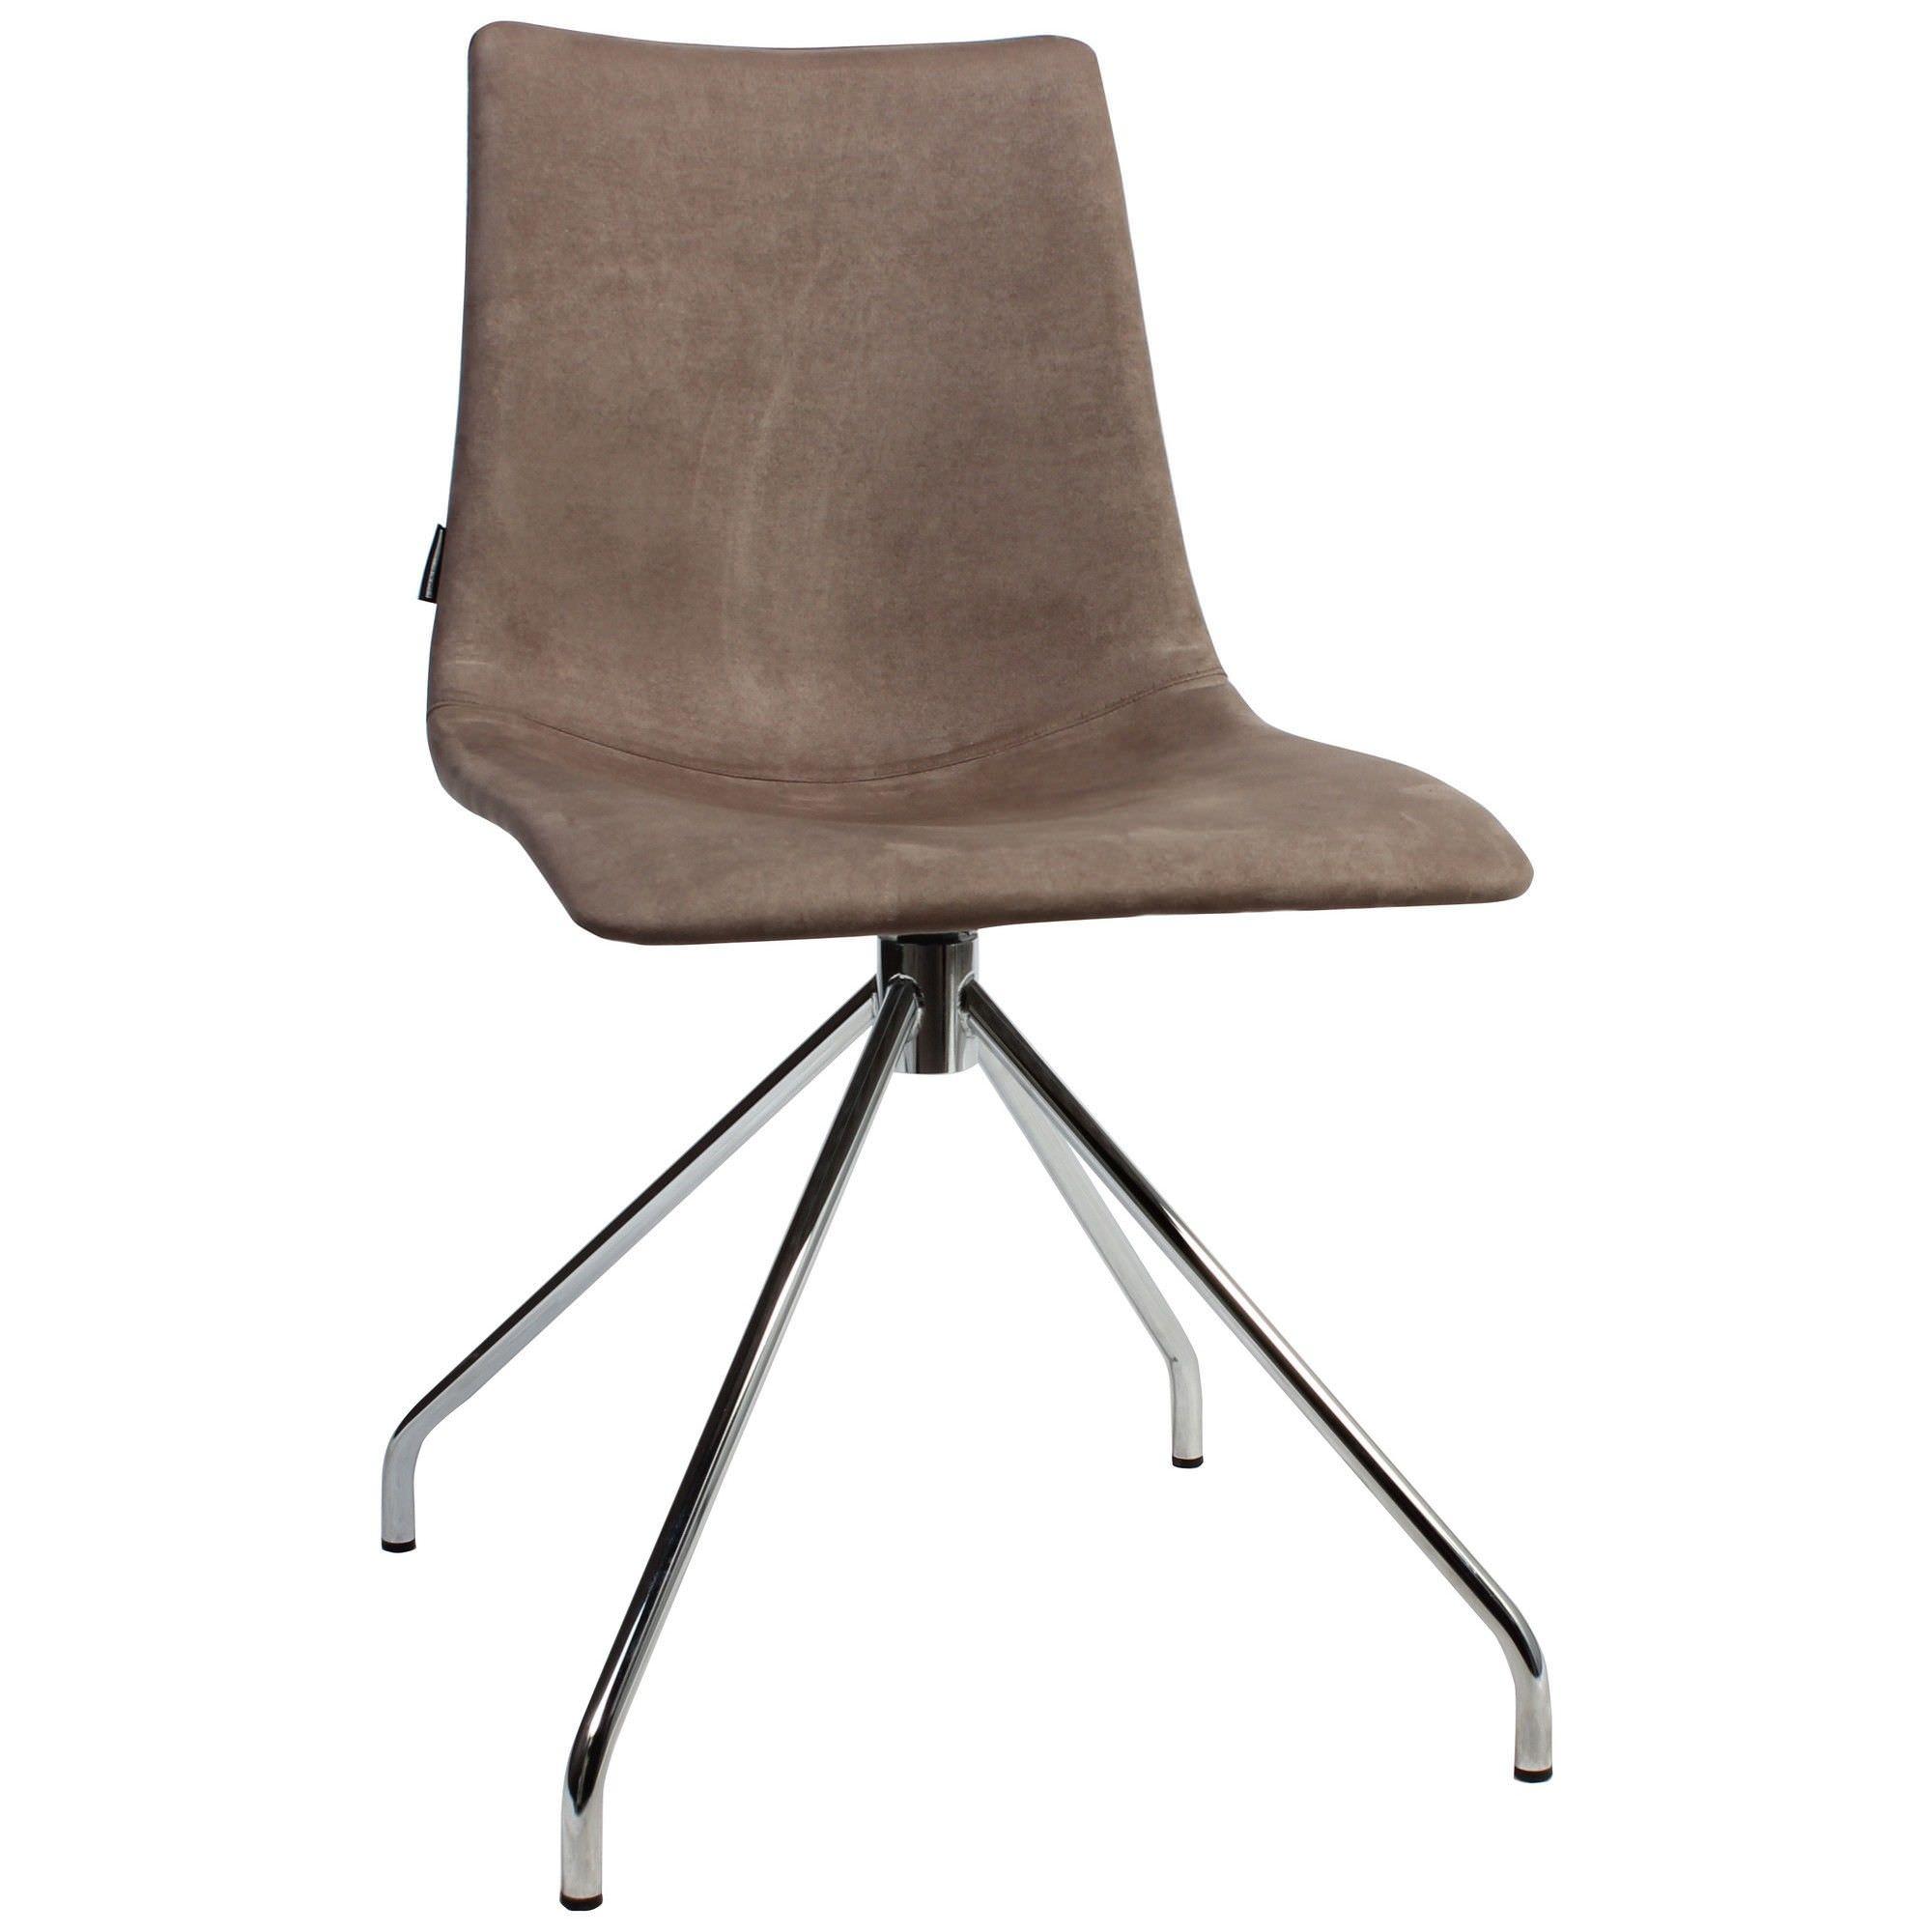 Zebra Pop Italian Made Commercial Grade Fabric Dining Chair, Trestle Leg, Brown / Chrome